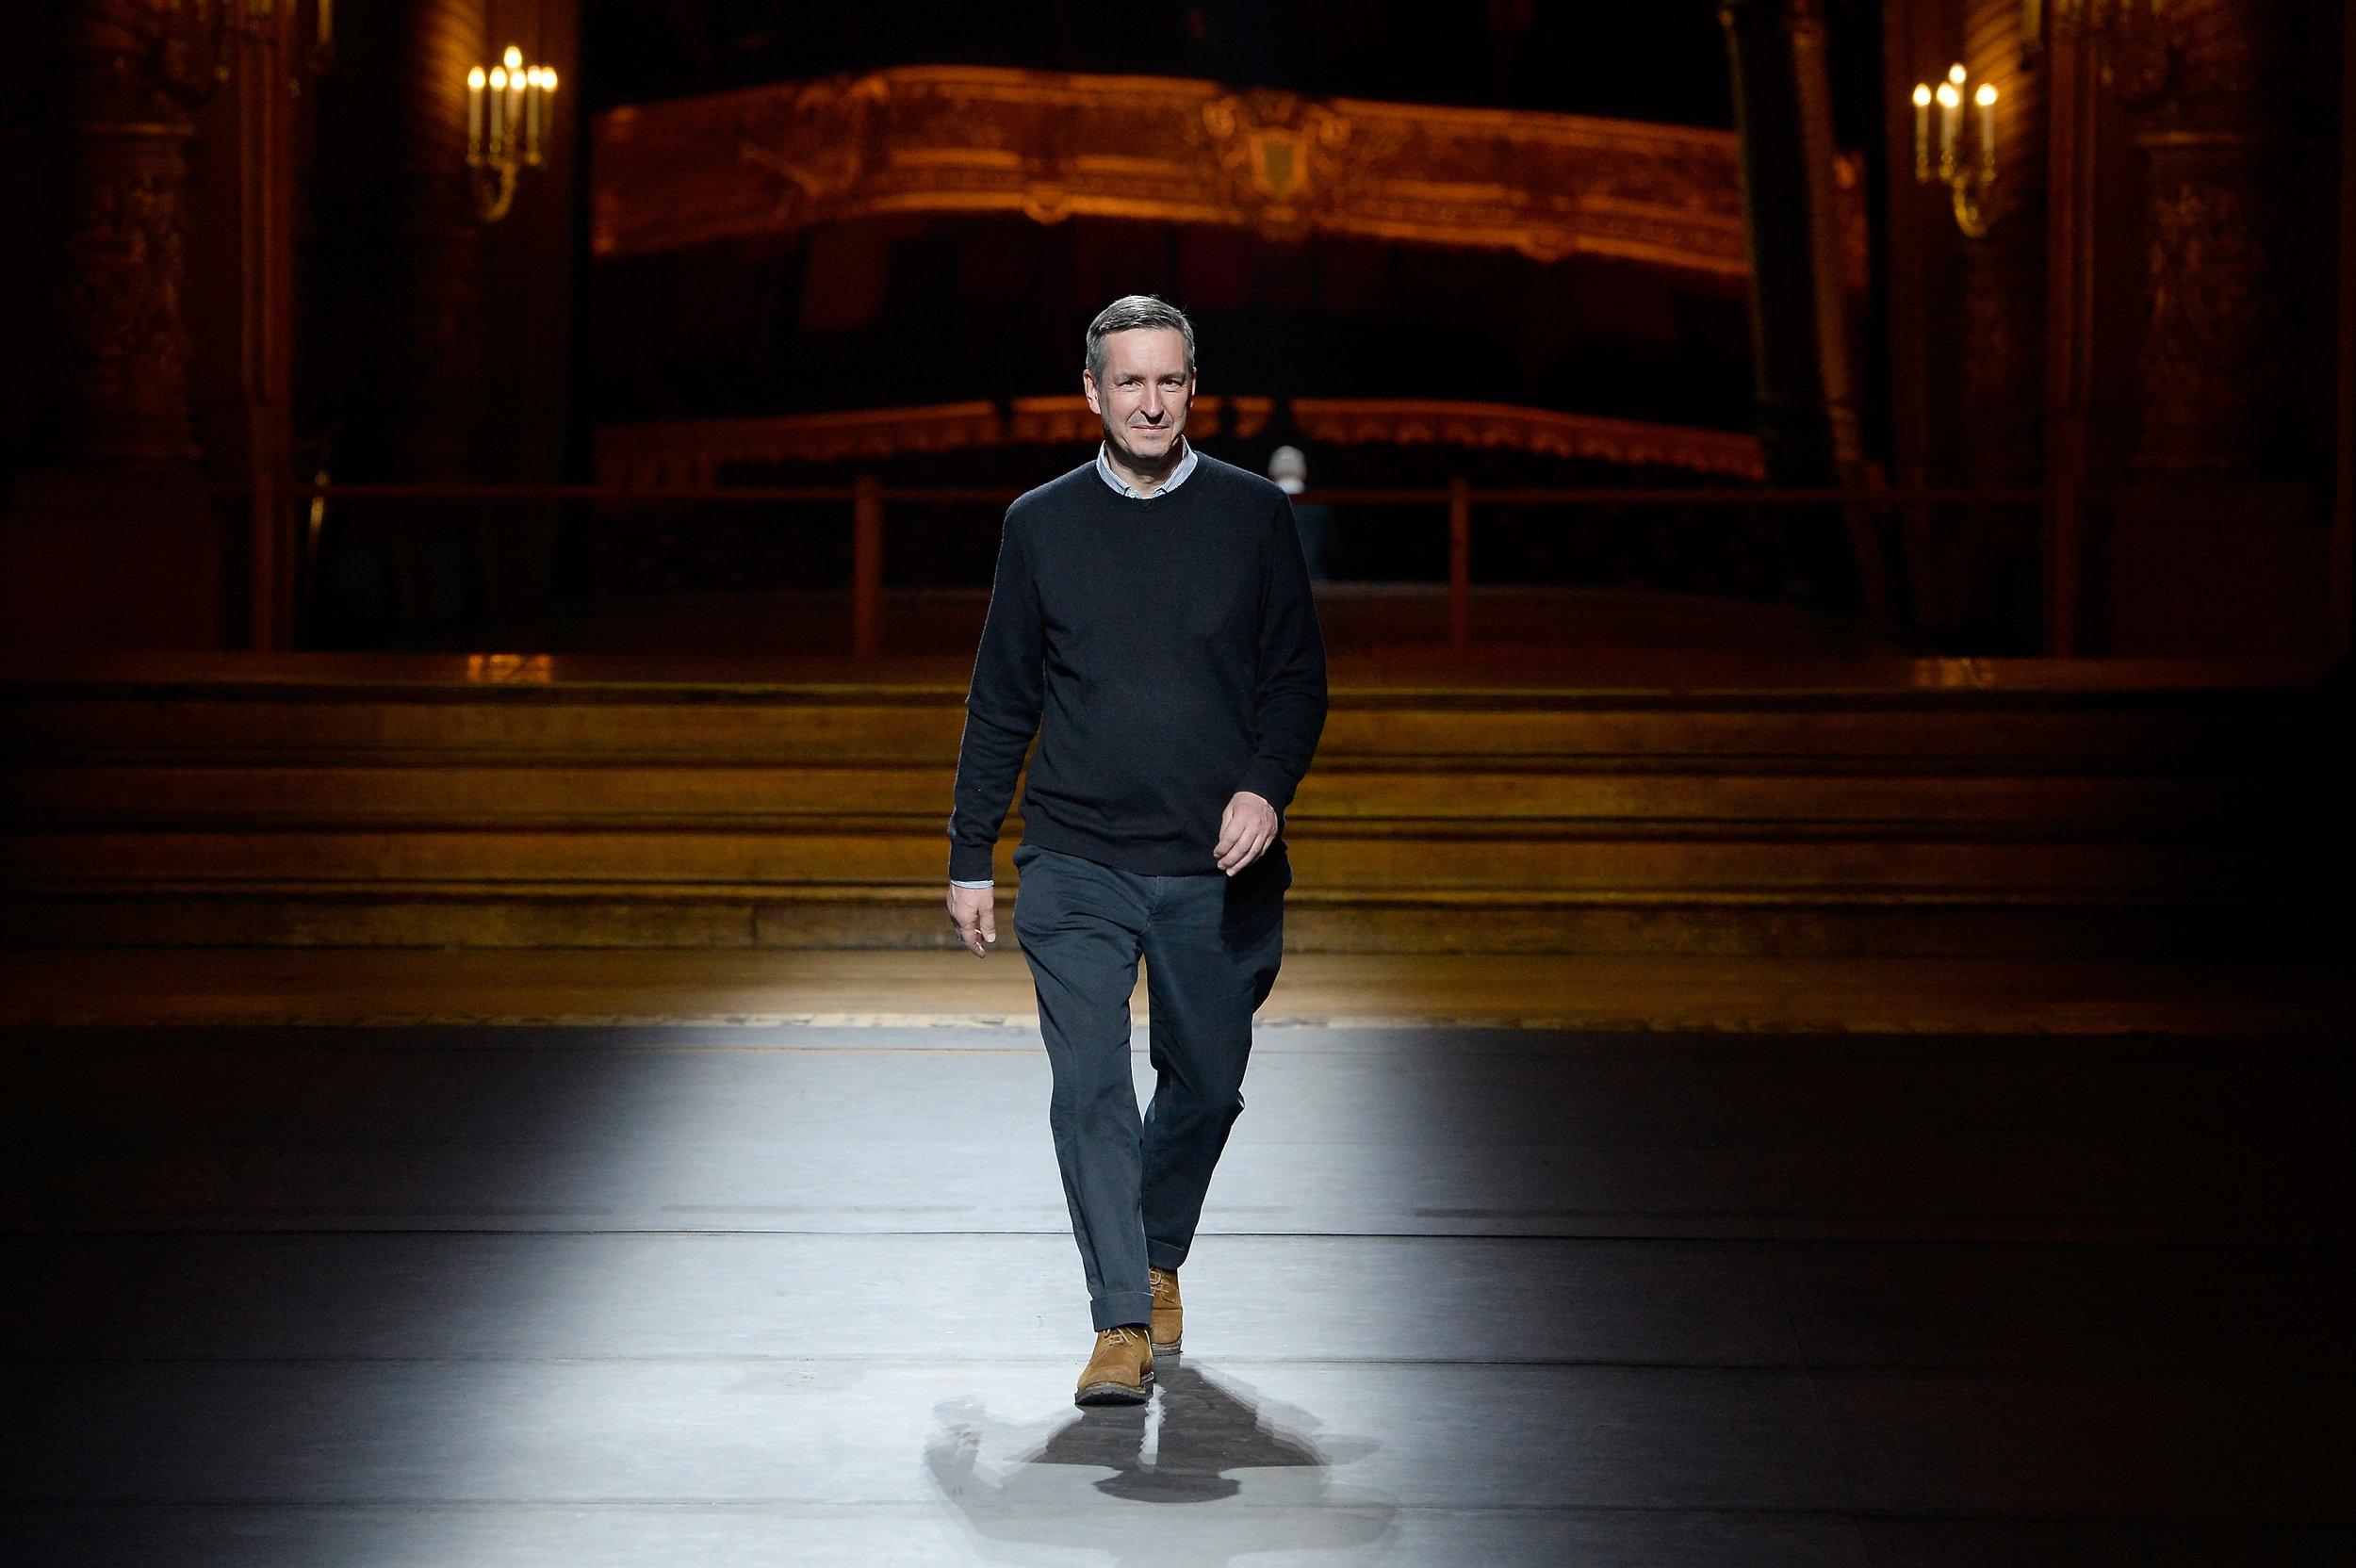 Dries Van Noten, Menswear Show Fall/Winter 2016-2017